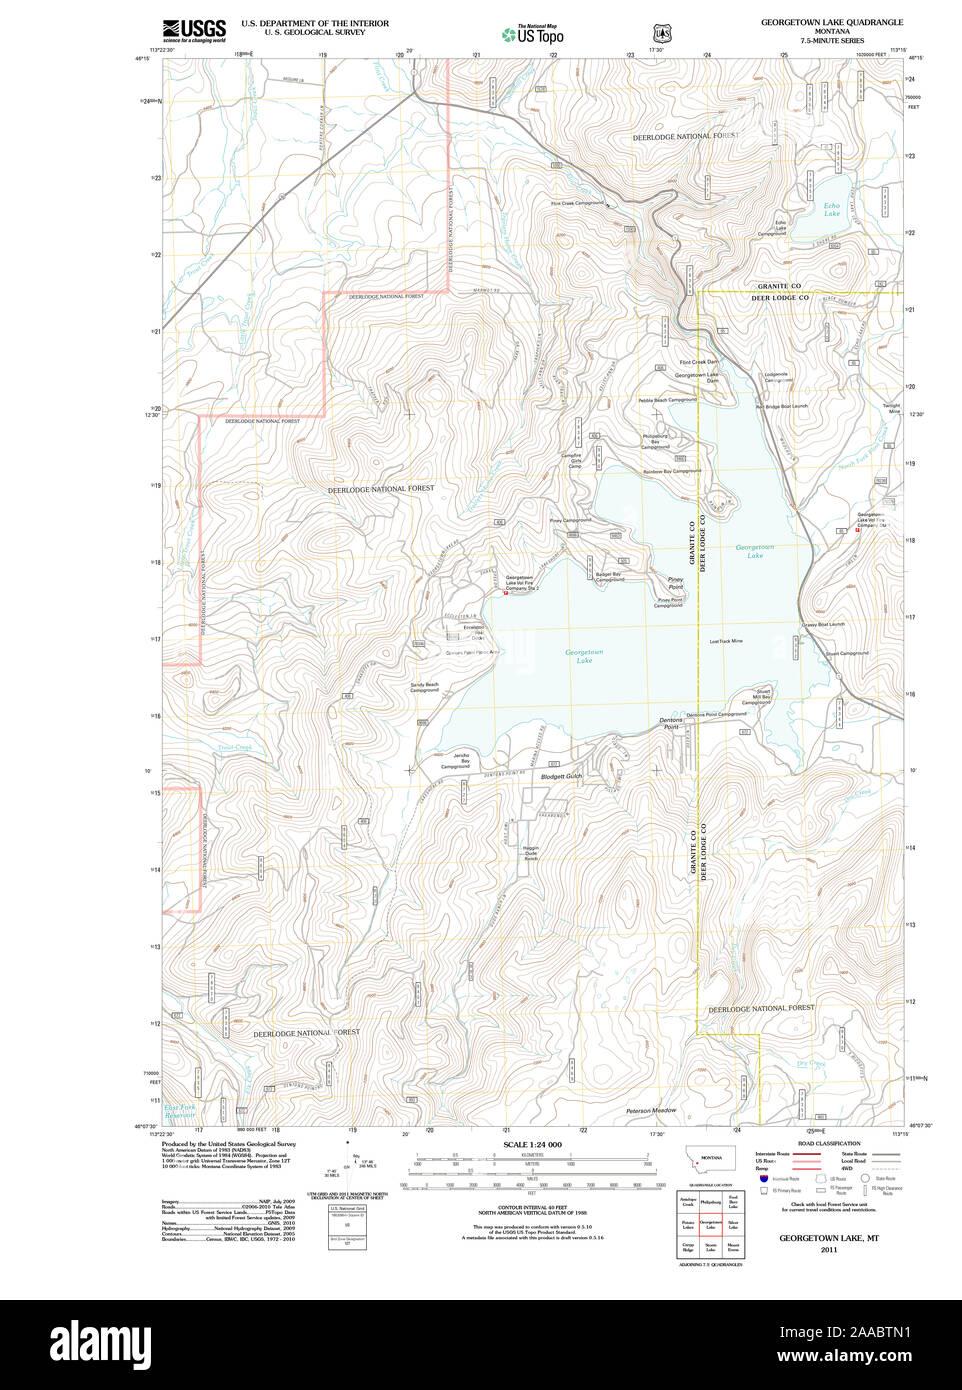 georgetown lake mt map Usgs Topo Map Montana Mt Georgetown Lake 20110525 Tm Restoration georgetown lake mt map